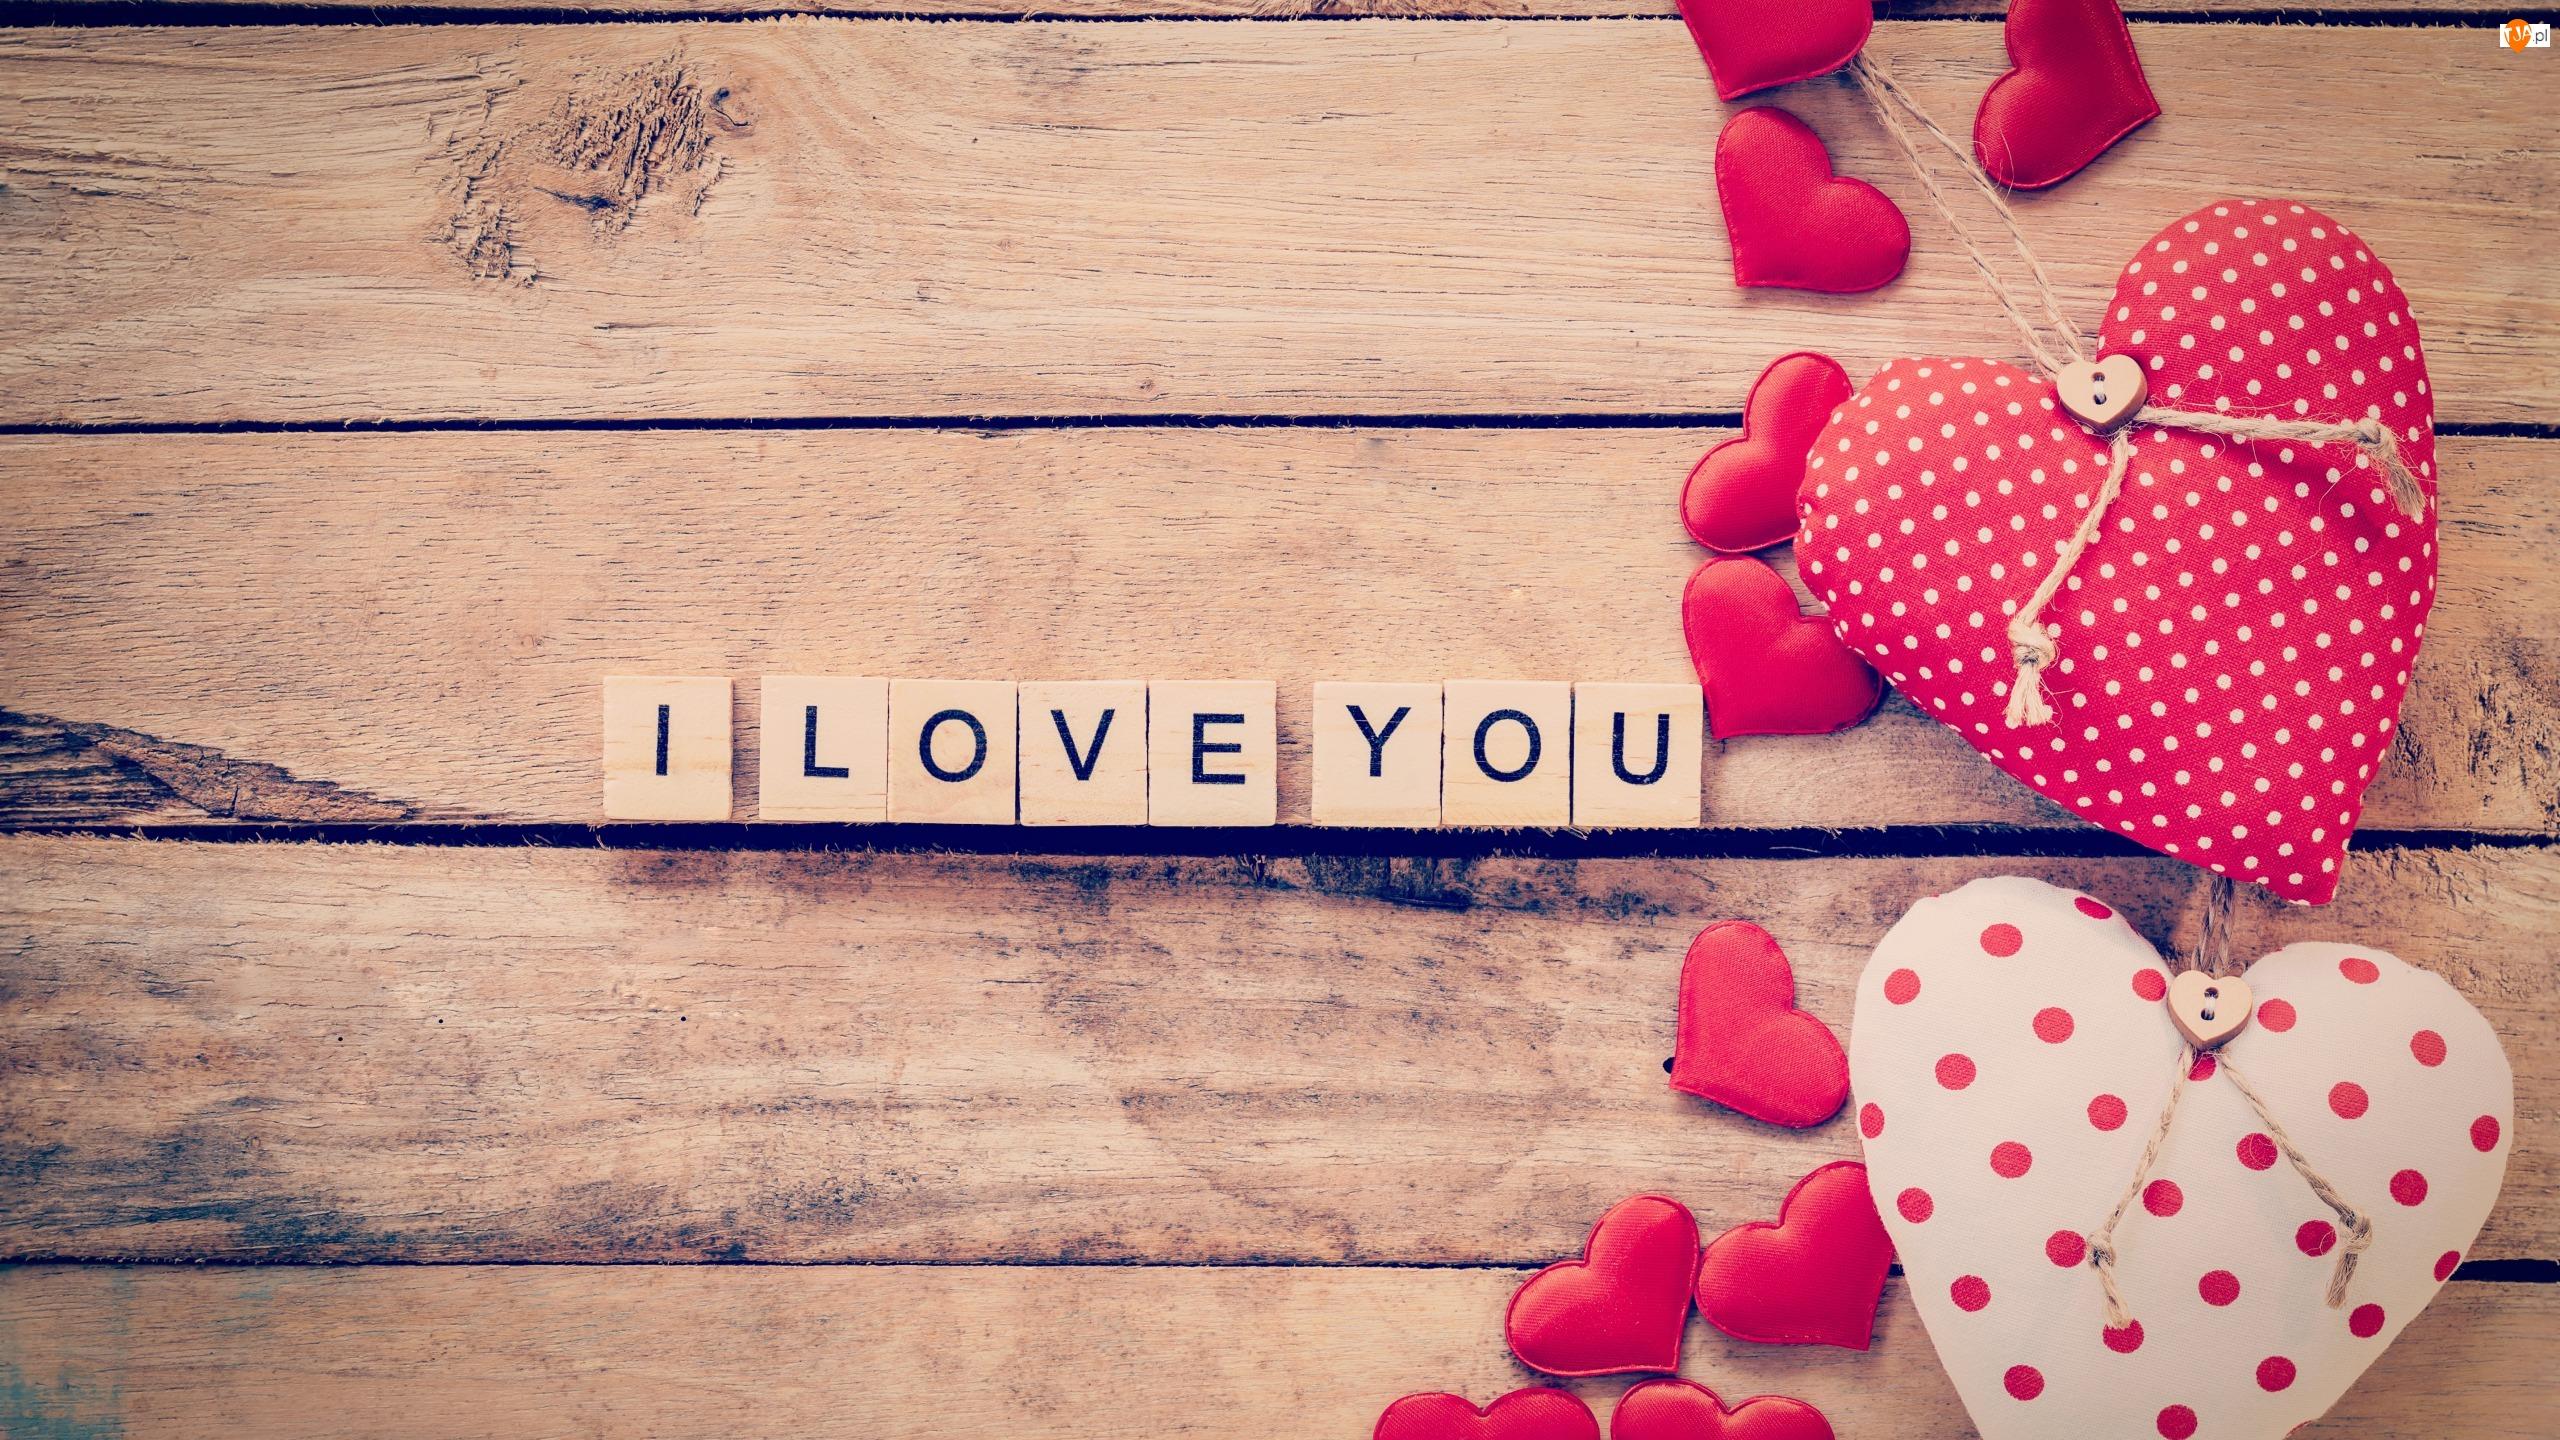 Deski, Walentynki, I love you, Napis, Serca